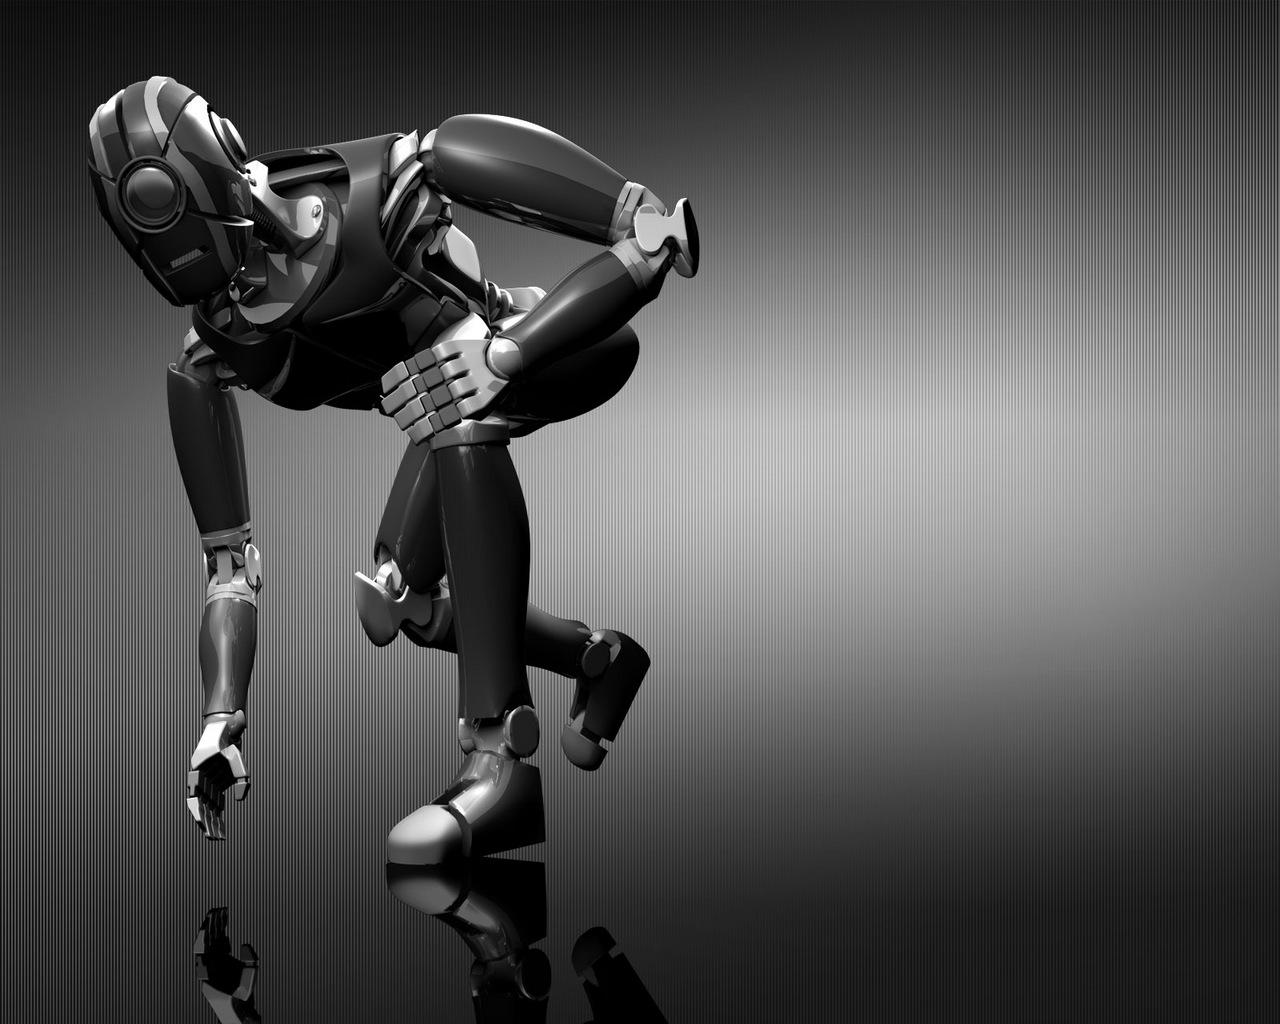 90 903275 gambar wallpaper keren 3d robotics pictures free download